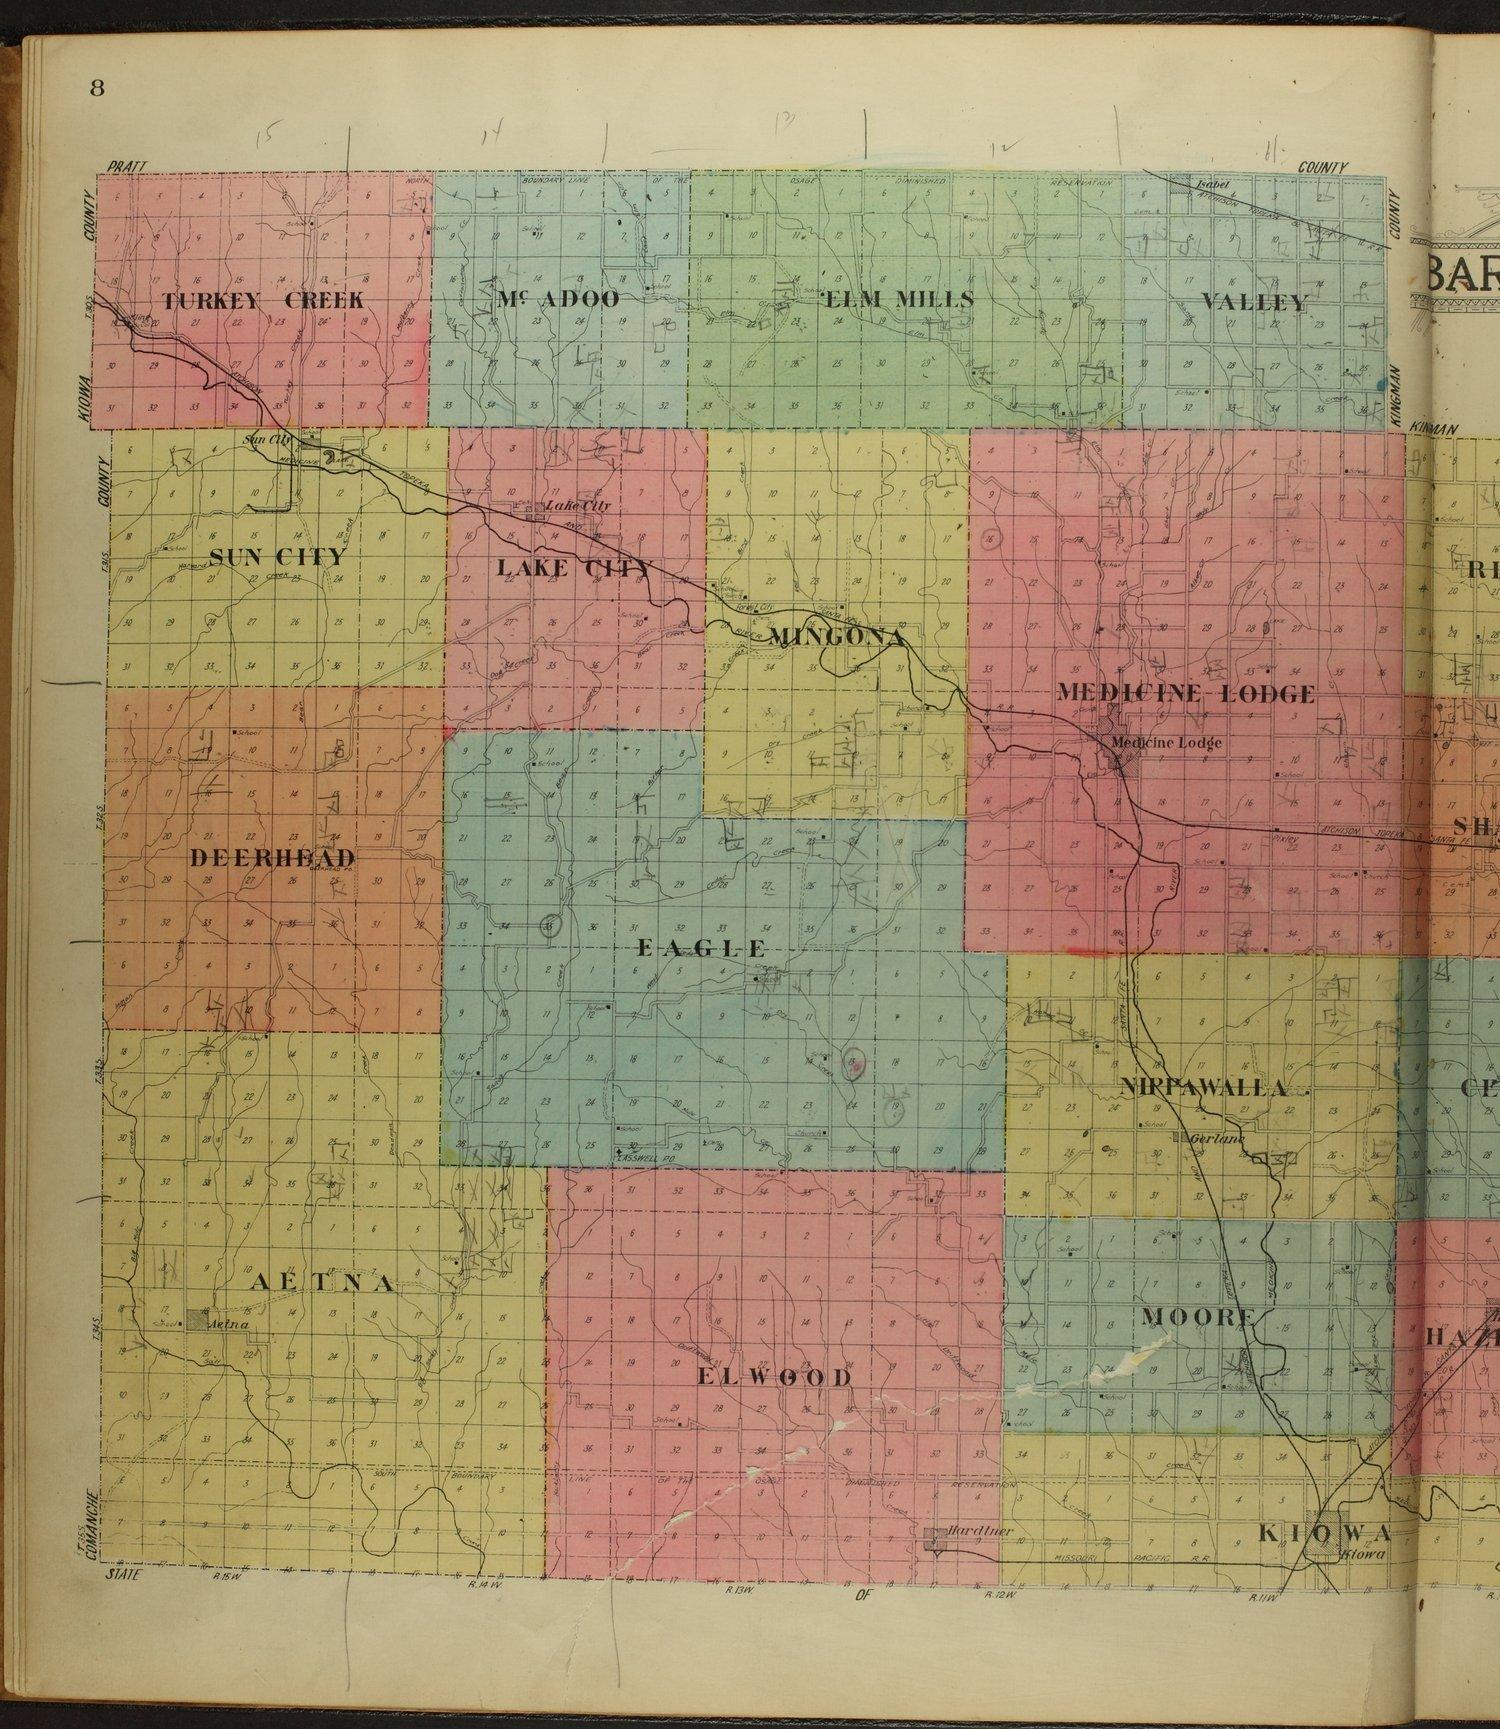 Standard atlas of Barber County, Kansas - 8